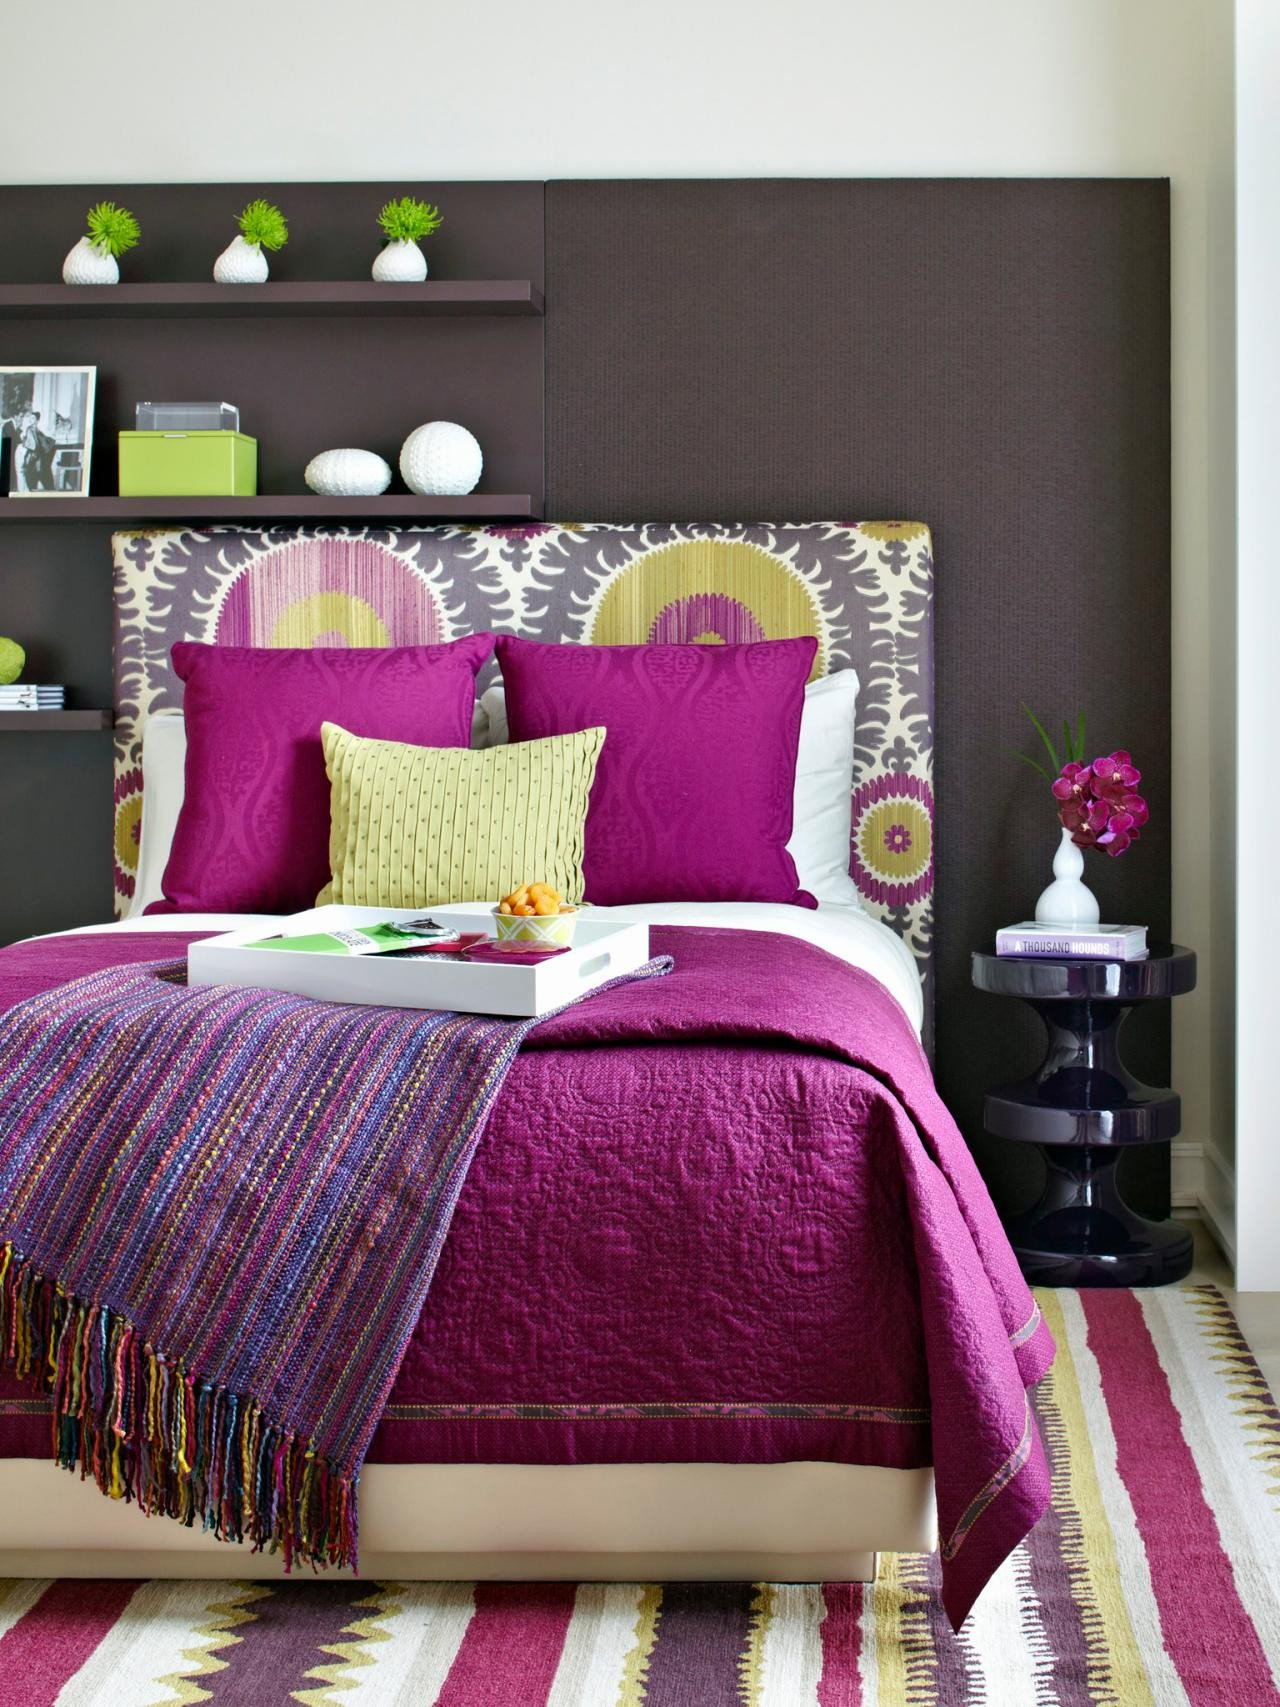 Purple and Grey Bedroom Decor Luxury Beautiful Bedrooms 15 Shades Of Gray Bedrooms & Bedroom Decorating Ideas